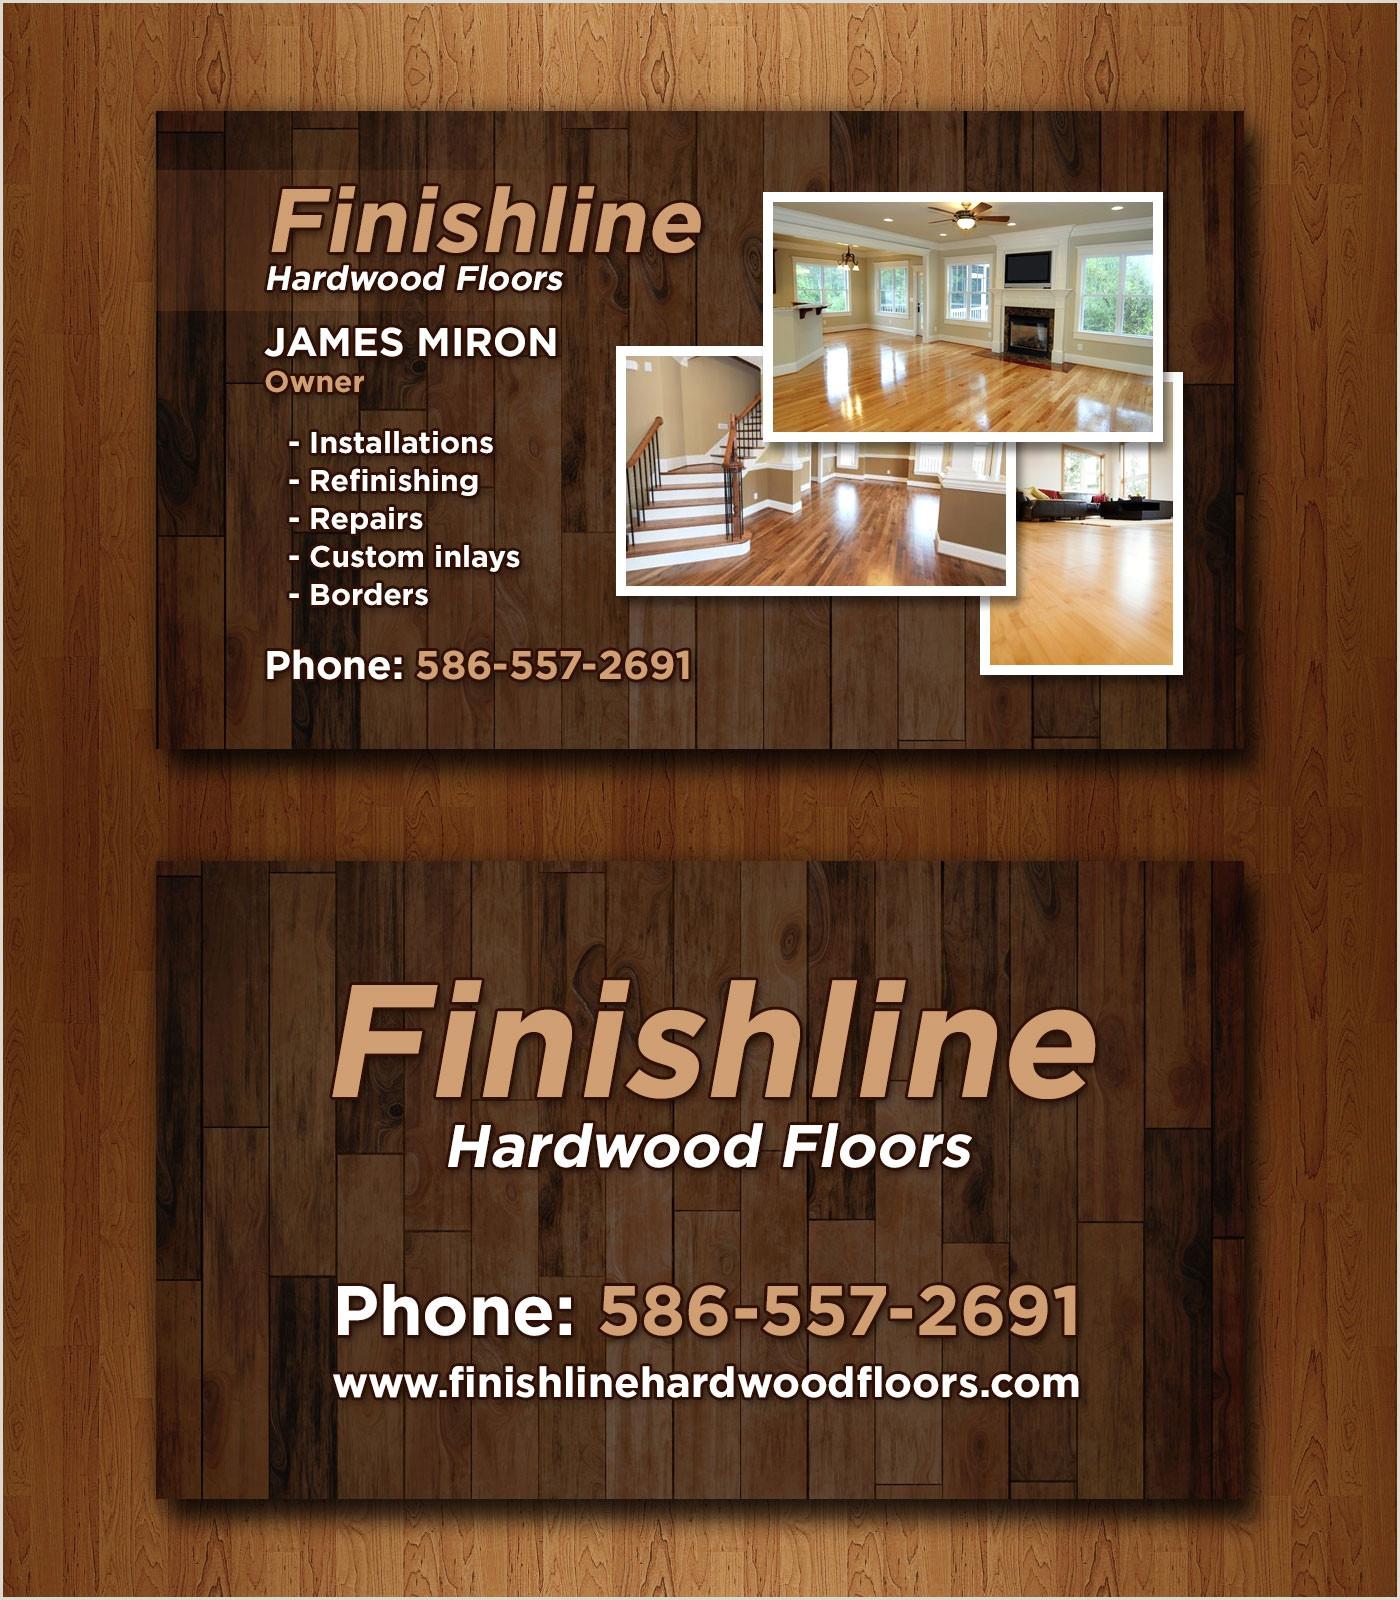 Best Business Cards We Buy Houses 14 Popular Hardwood Flooring Business Card Template